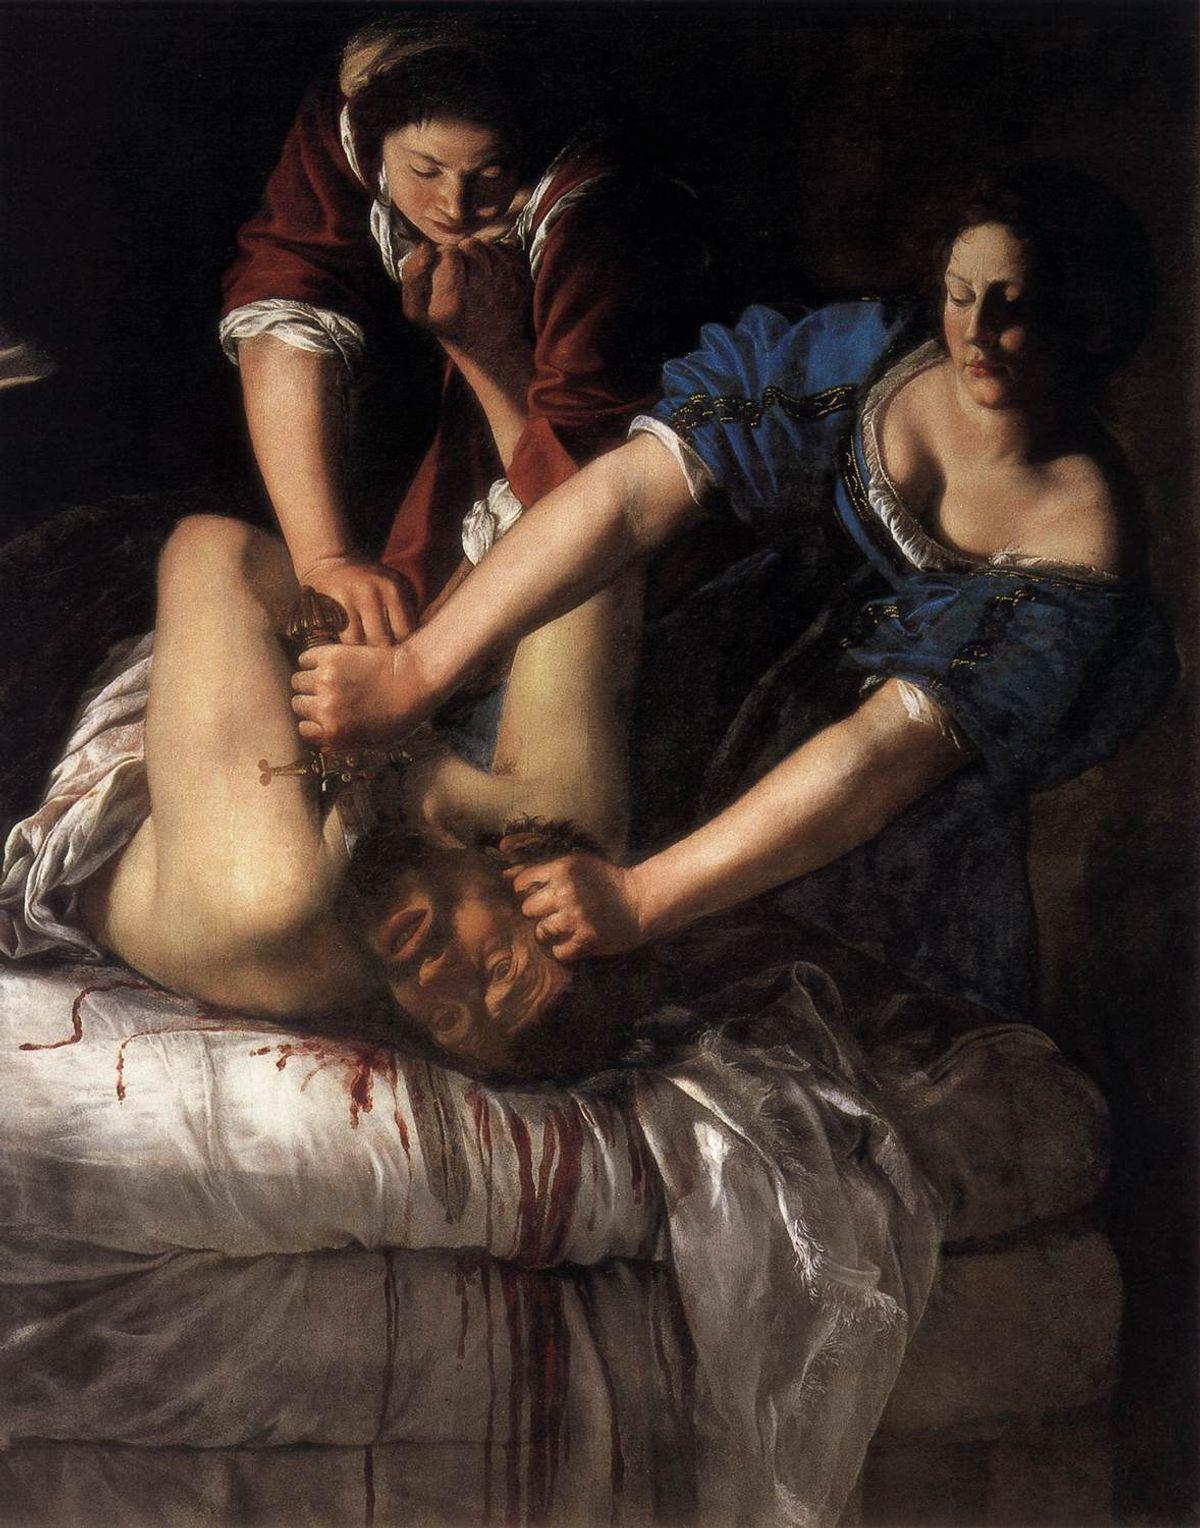 Artemisia_Gentileschi_-_Judith_Beheading_Holofernes_-_WGA8563